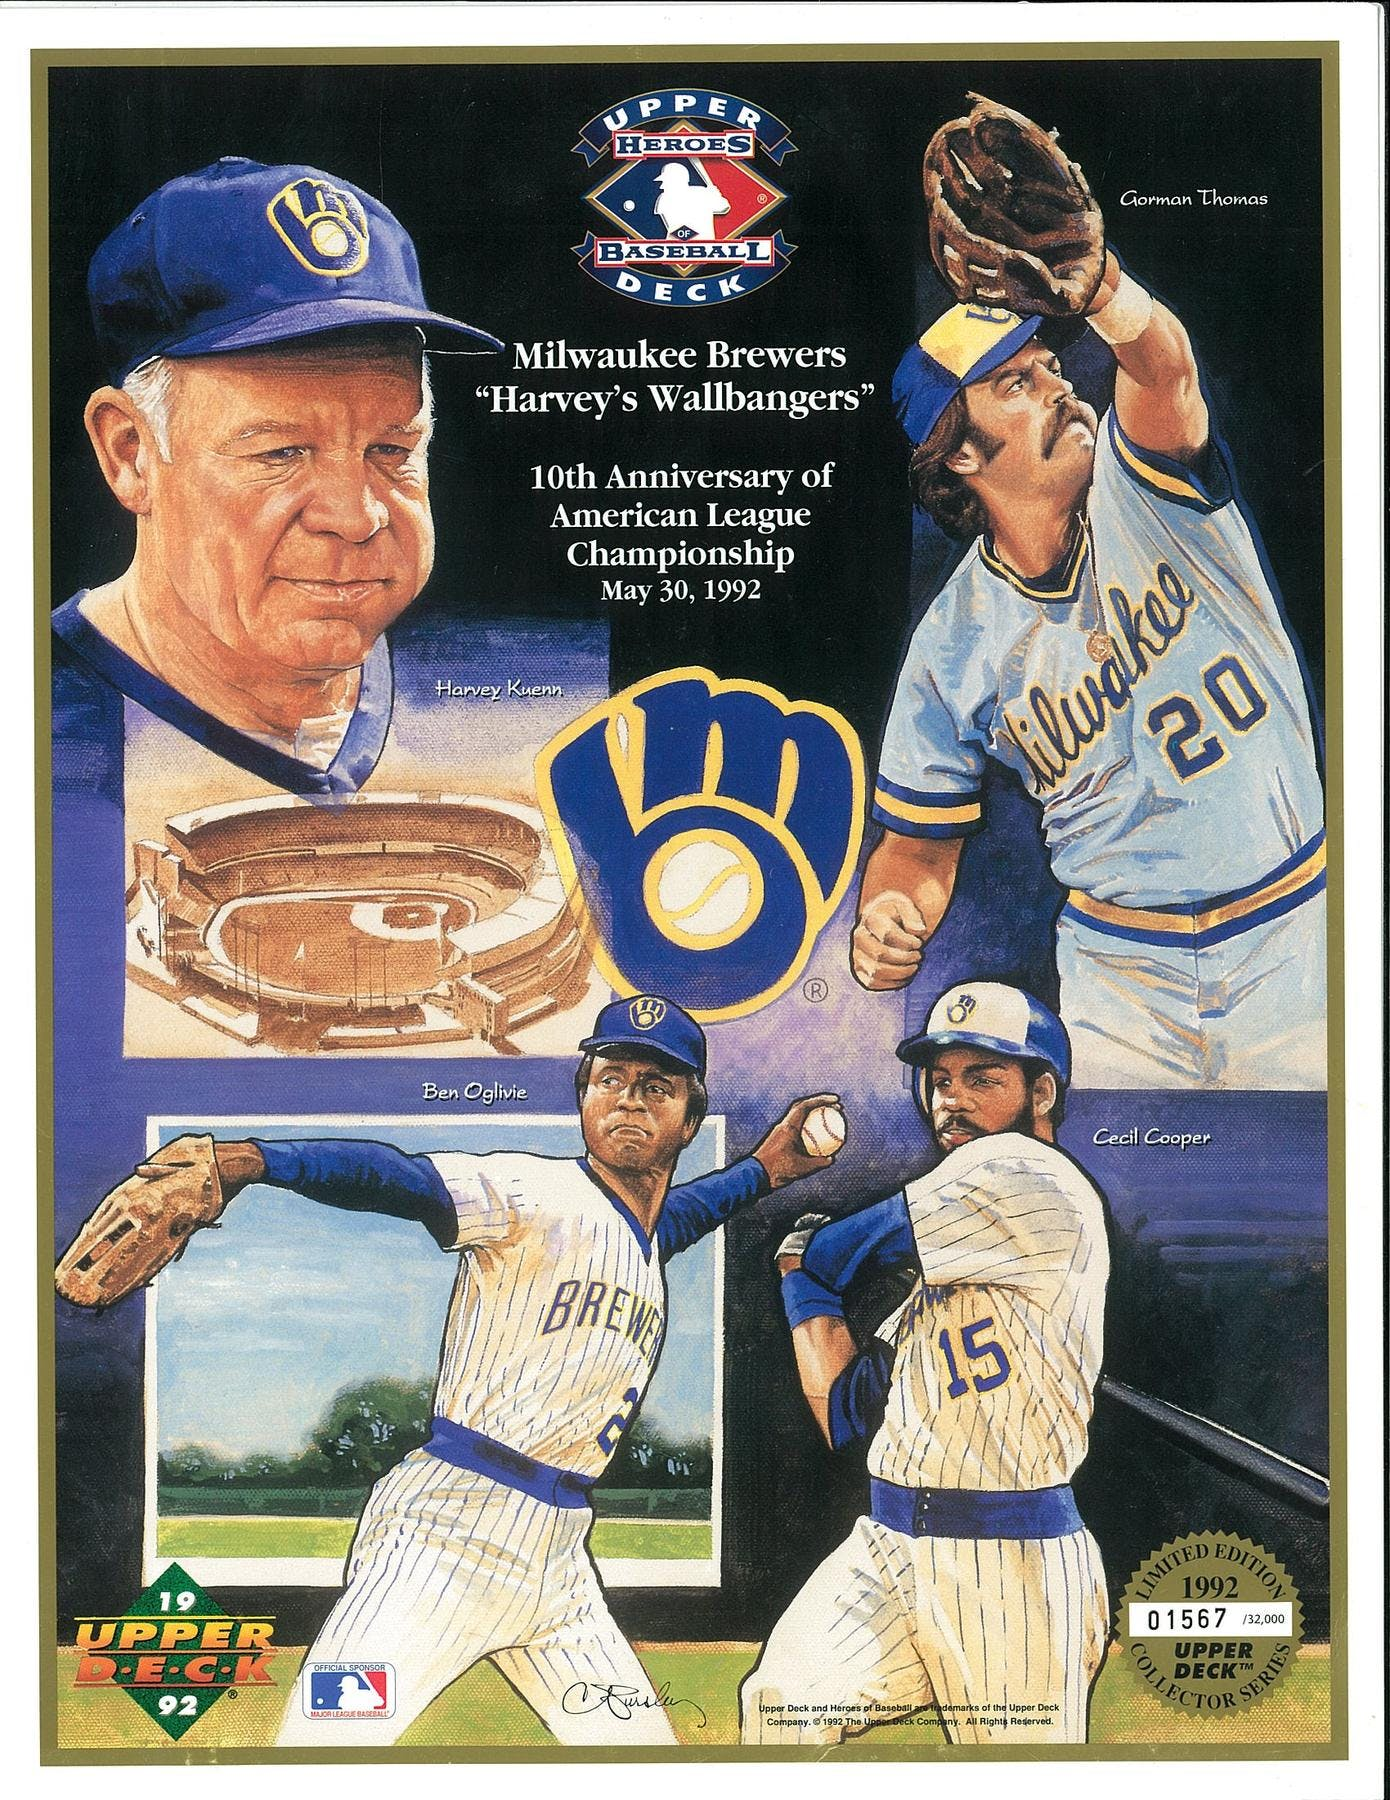 1992 Upper Deck Heroes Of Baseball Milwaukee Brewers Wallbangers Commemorative Sheet